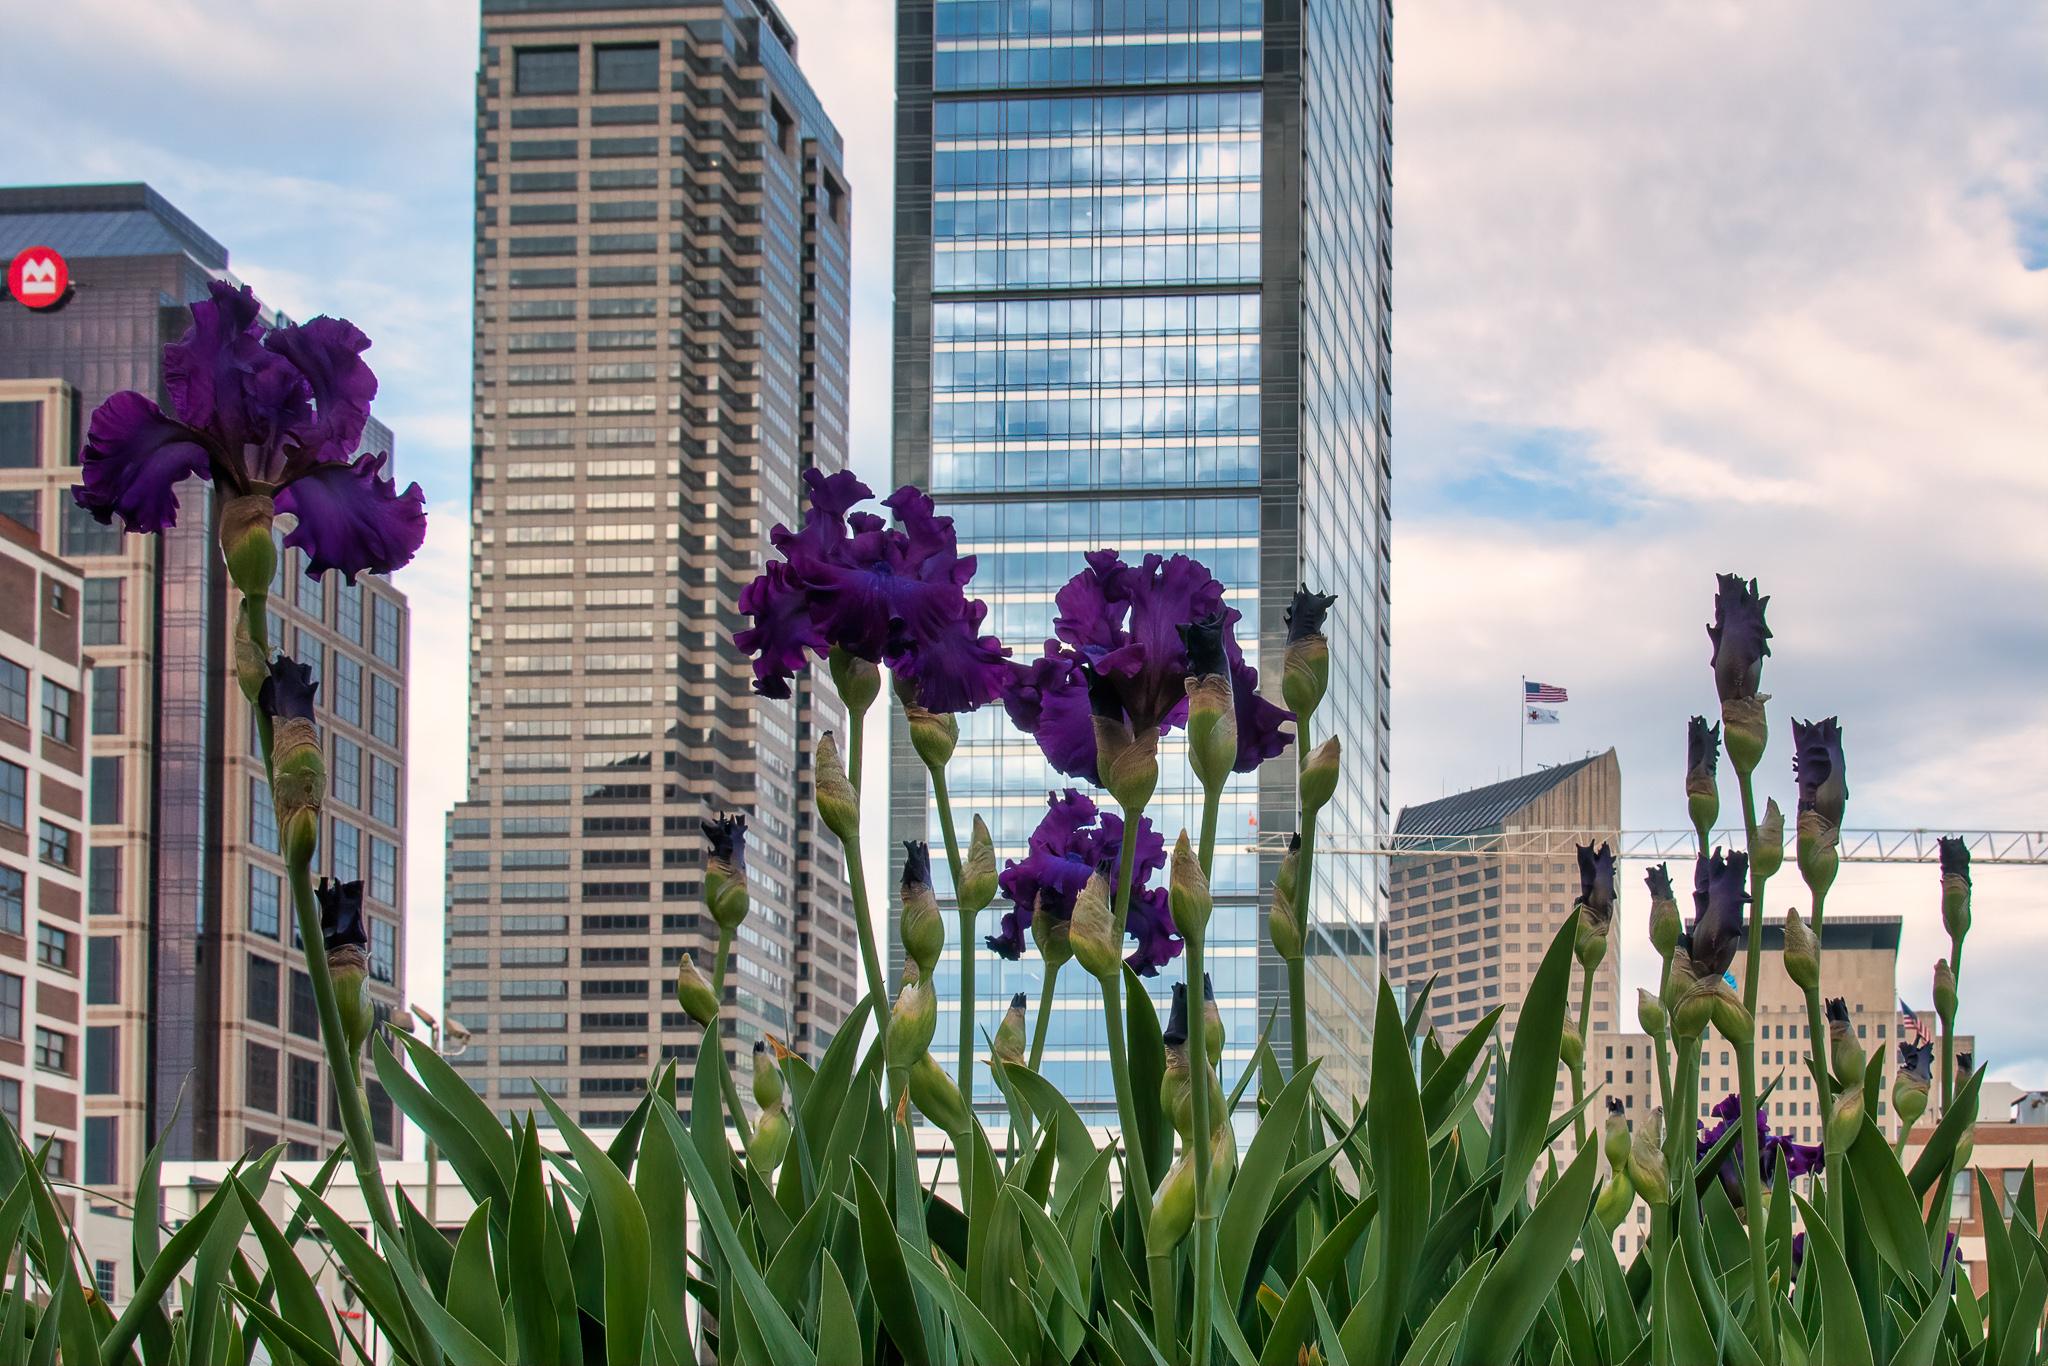 Purple Iris on the Indy Cultural Trail, along Alabama Street.